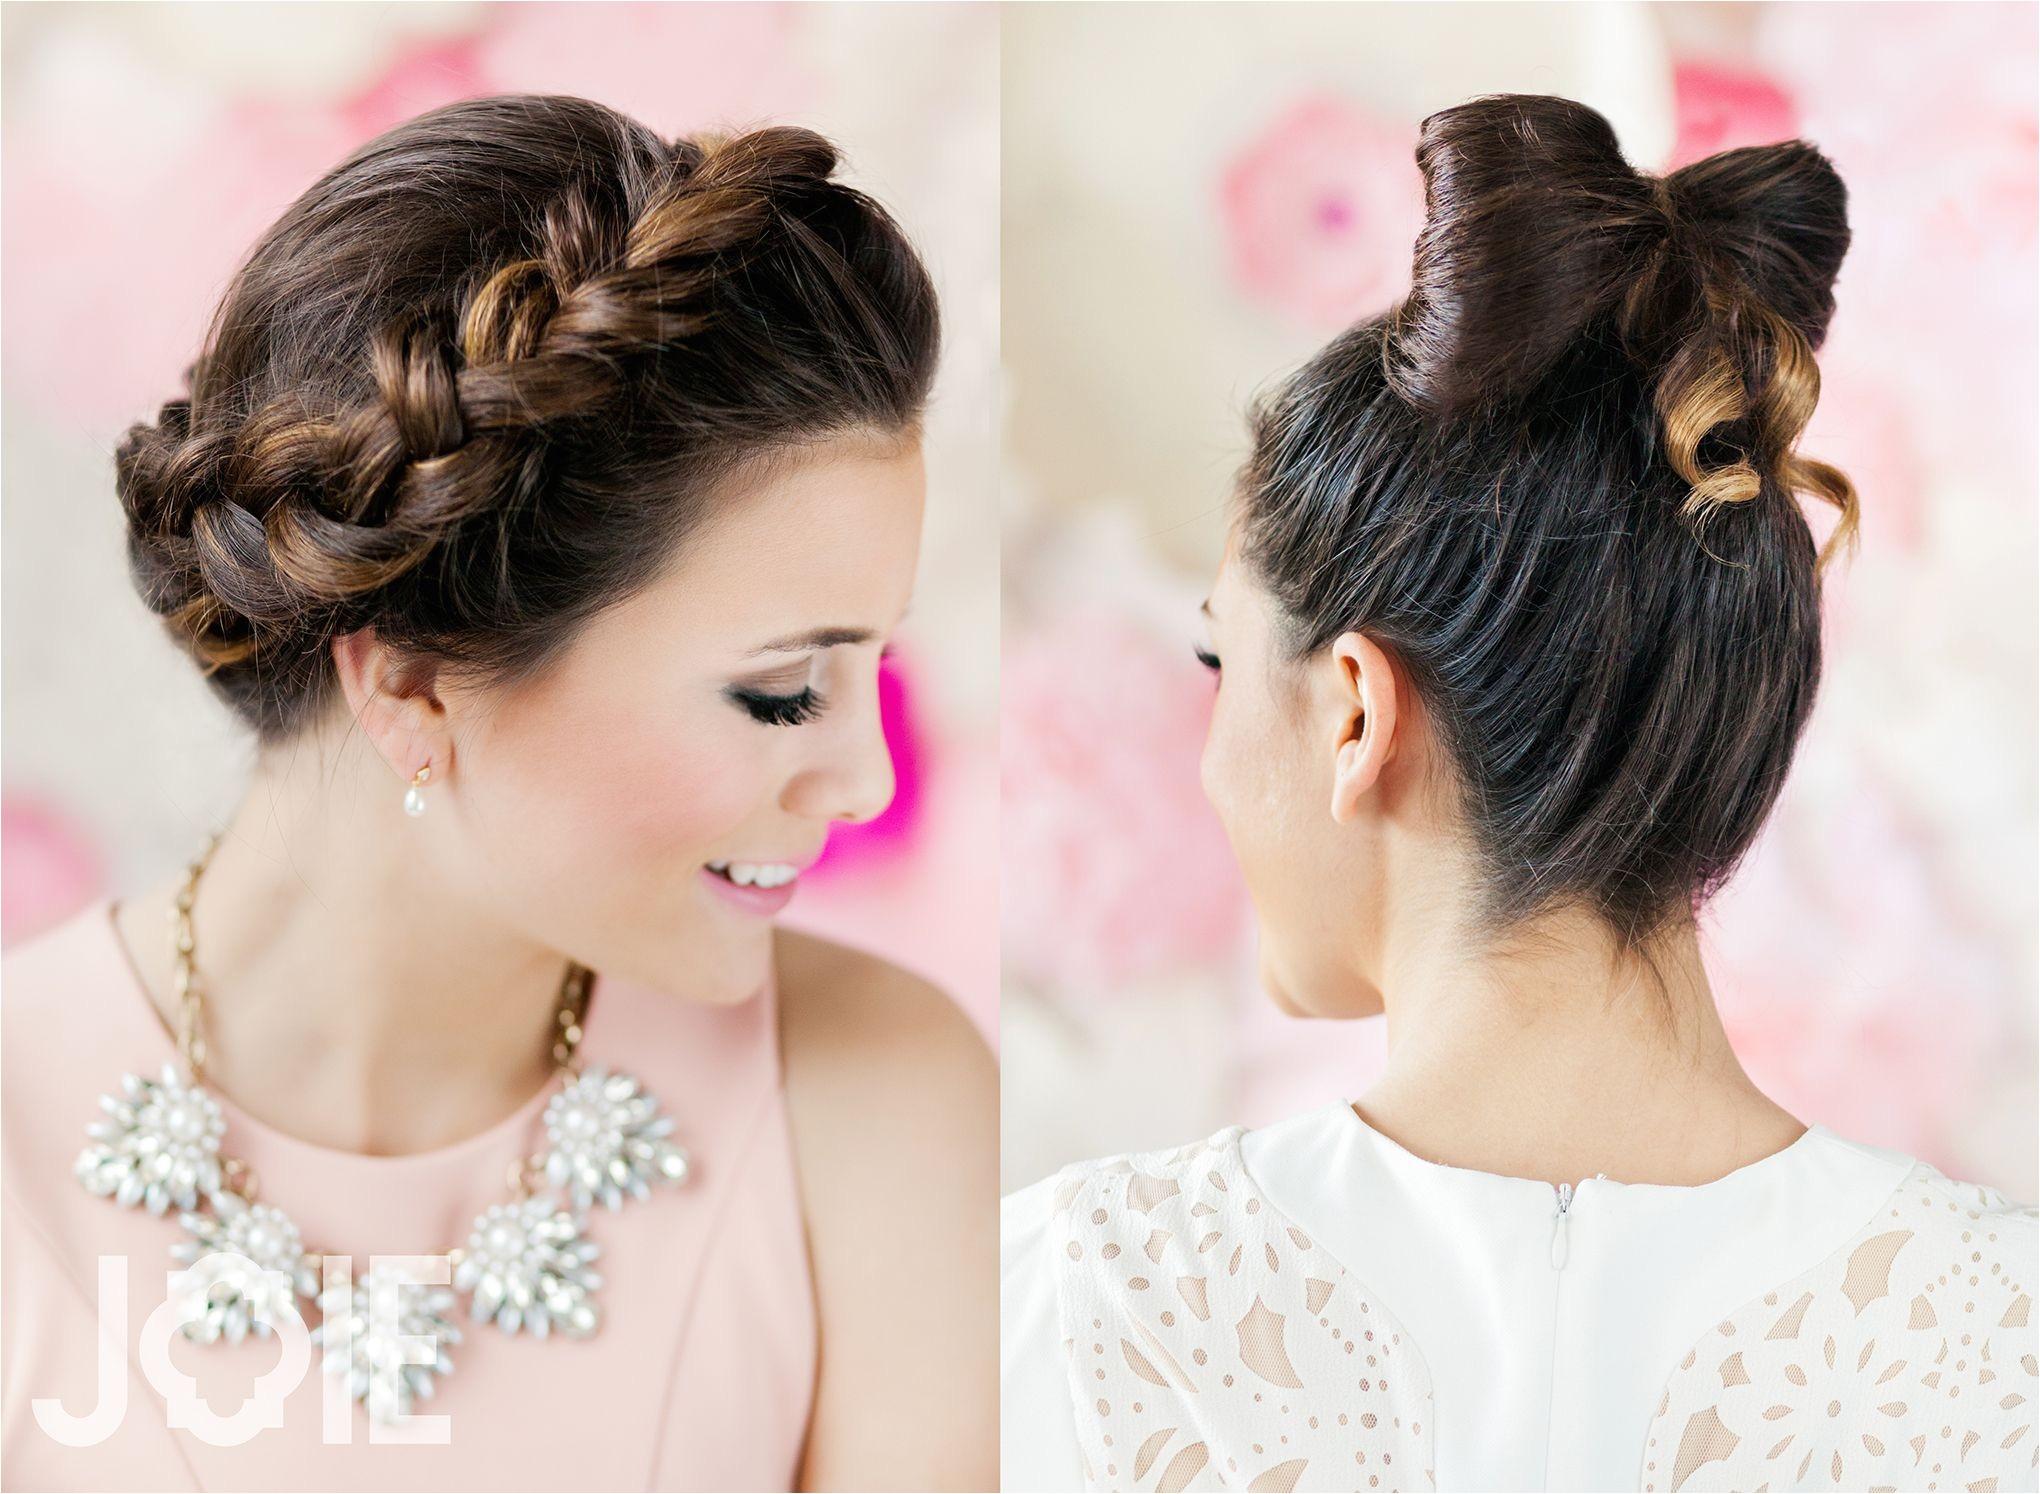 Bow hair Crown Braid High School girl Valentine s Day Shoot ideas Hair styles Creative hair styles Natural light studio session